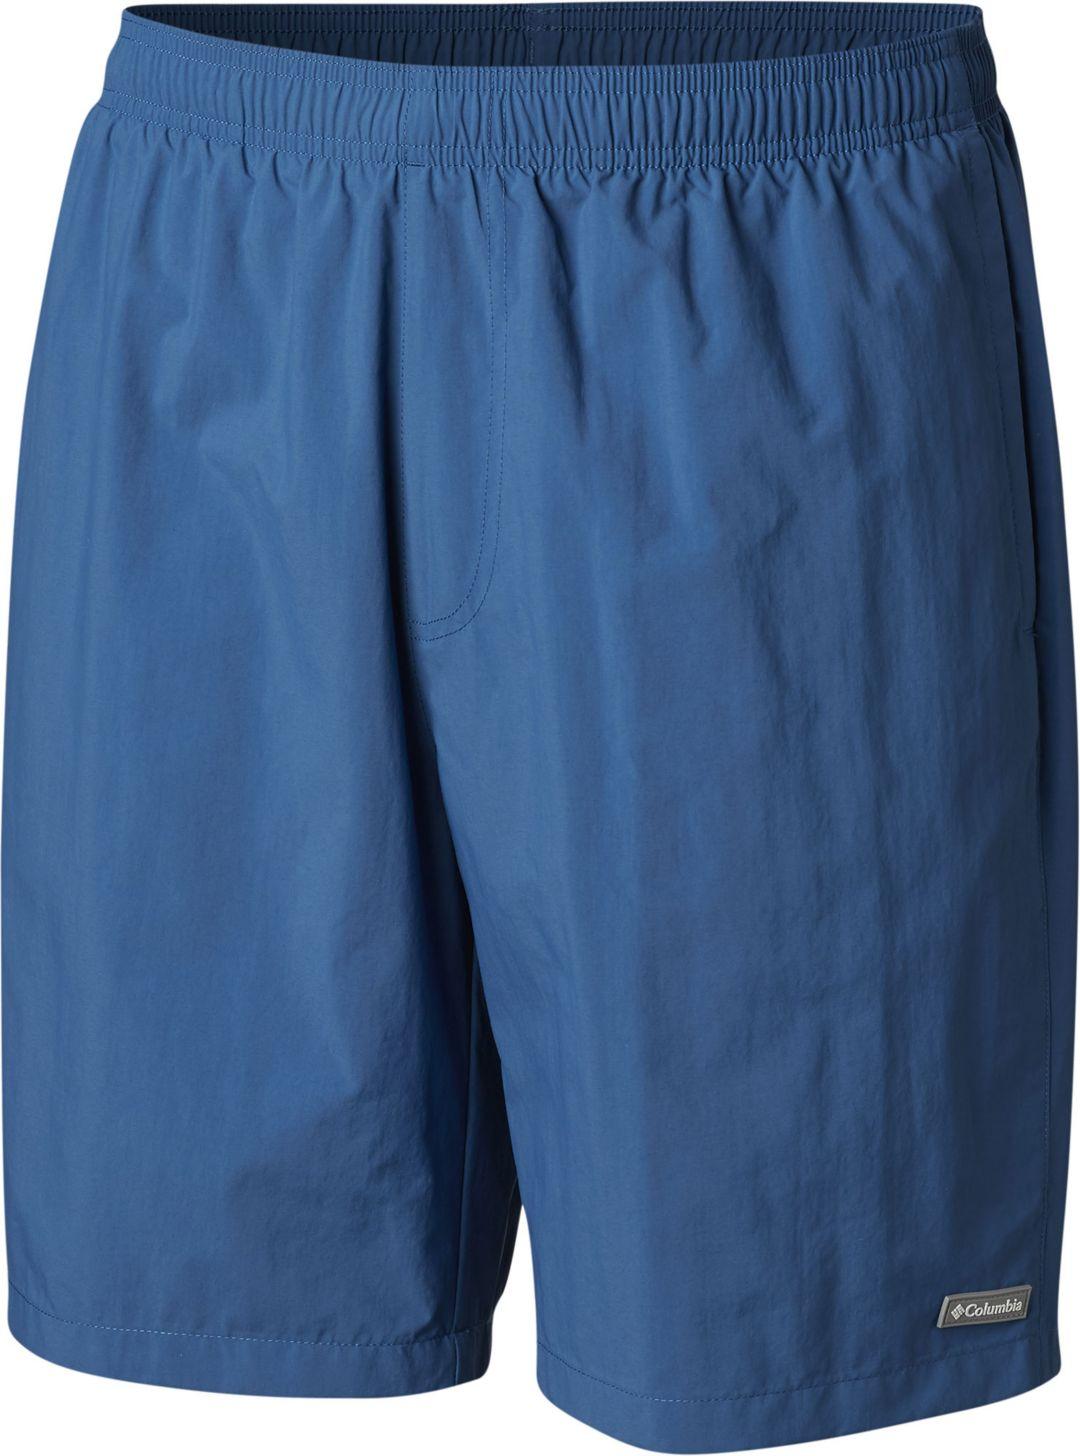 4b92fefef79 Columbia Men's Roatan Drifter Water Shorts | DICK'S Sporting Goods